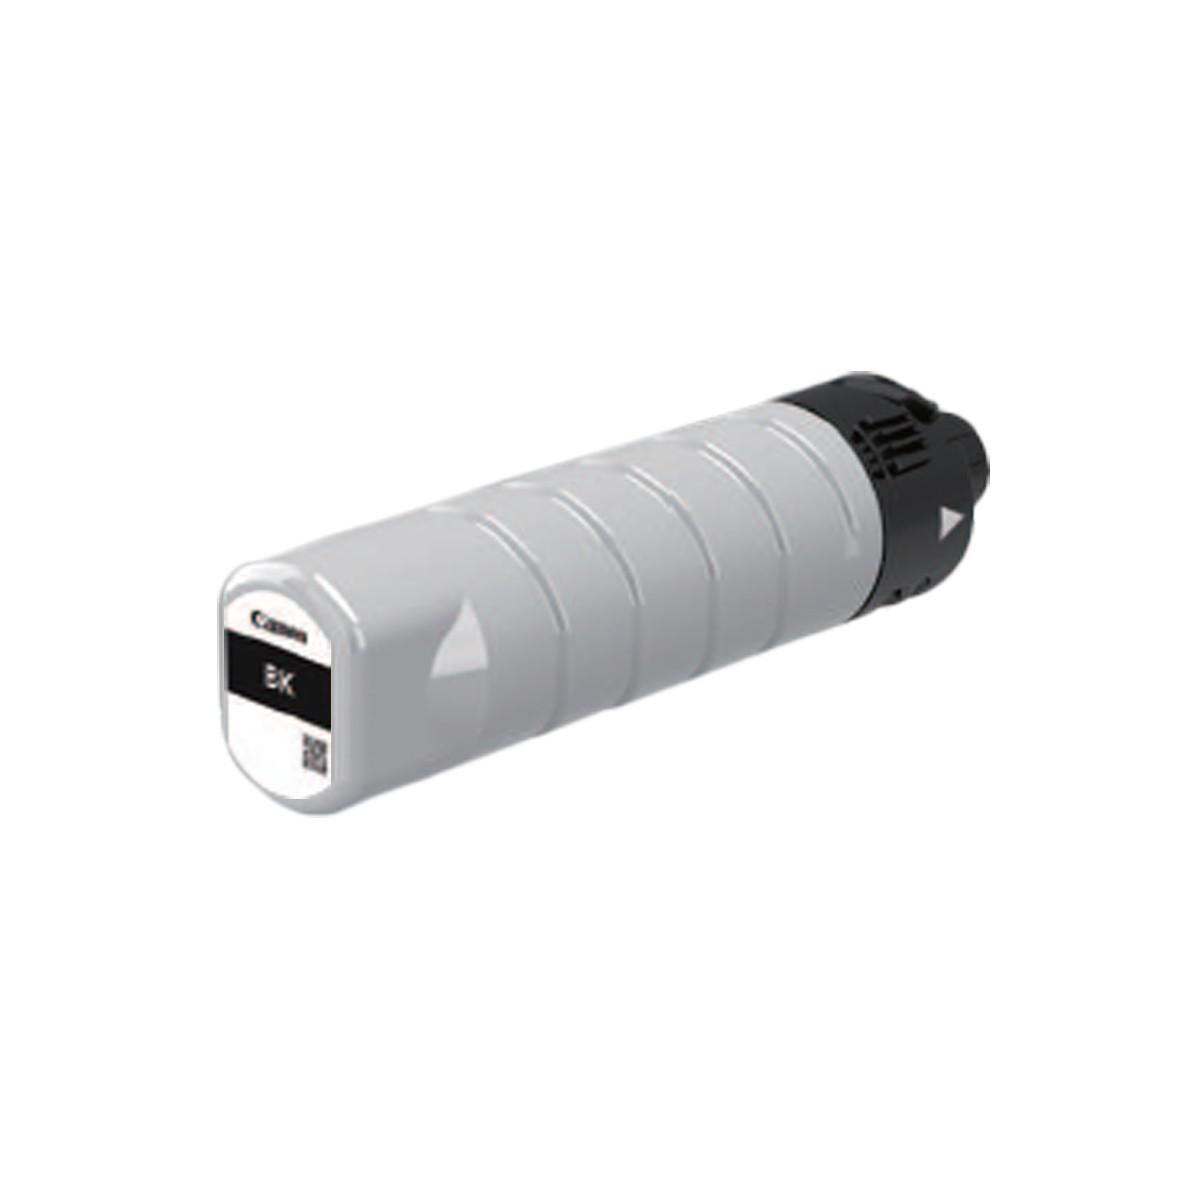 Cartucho de Tinta Canon PGI 7100XXL Preto | WG7140 7140 WG-7140 WG 7140 | Original